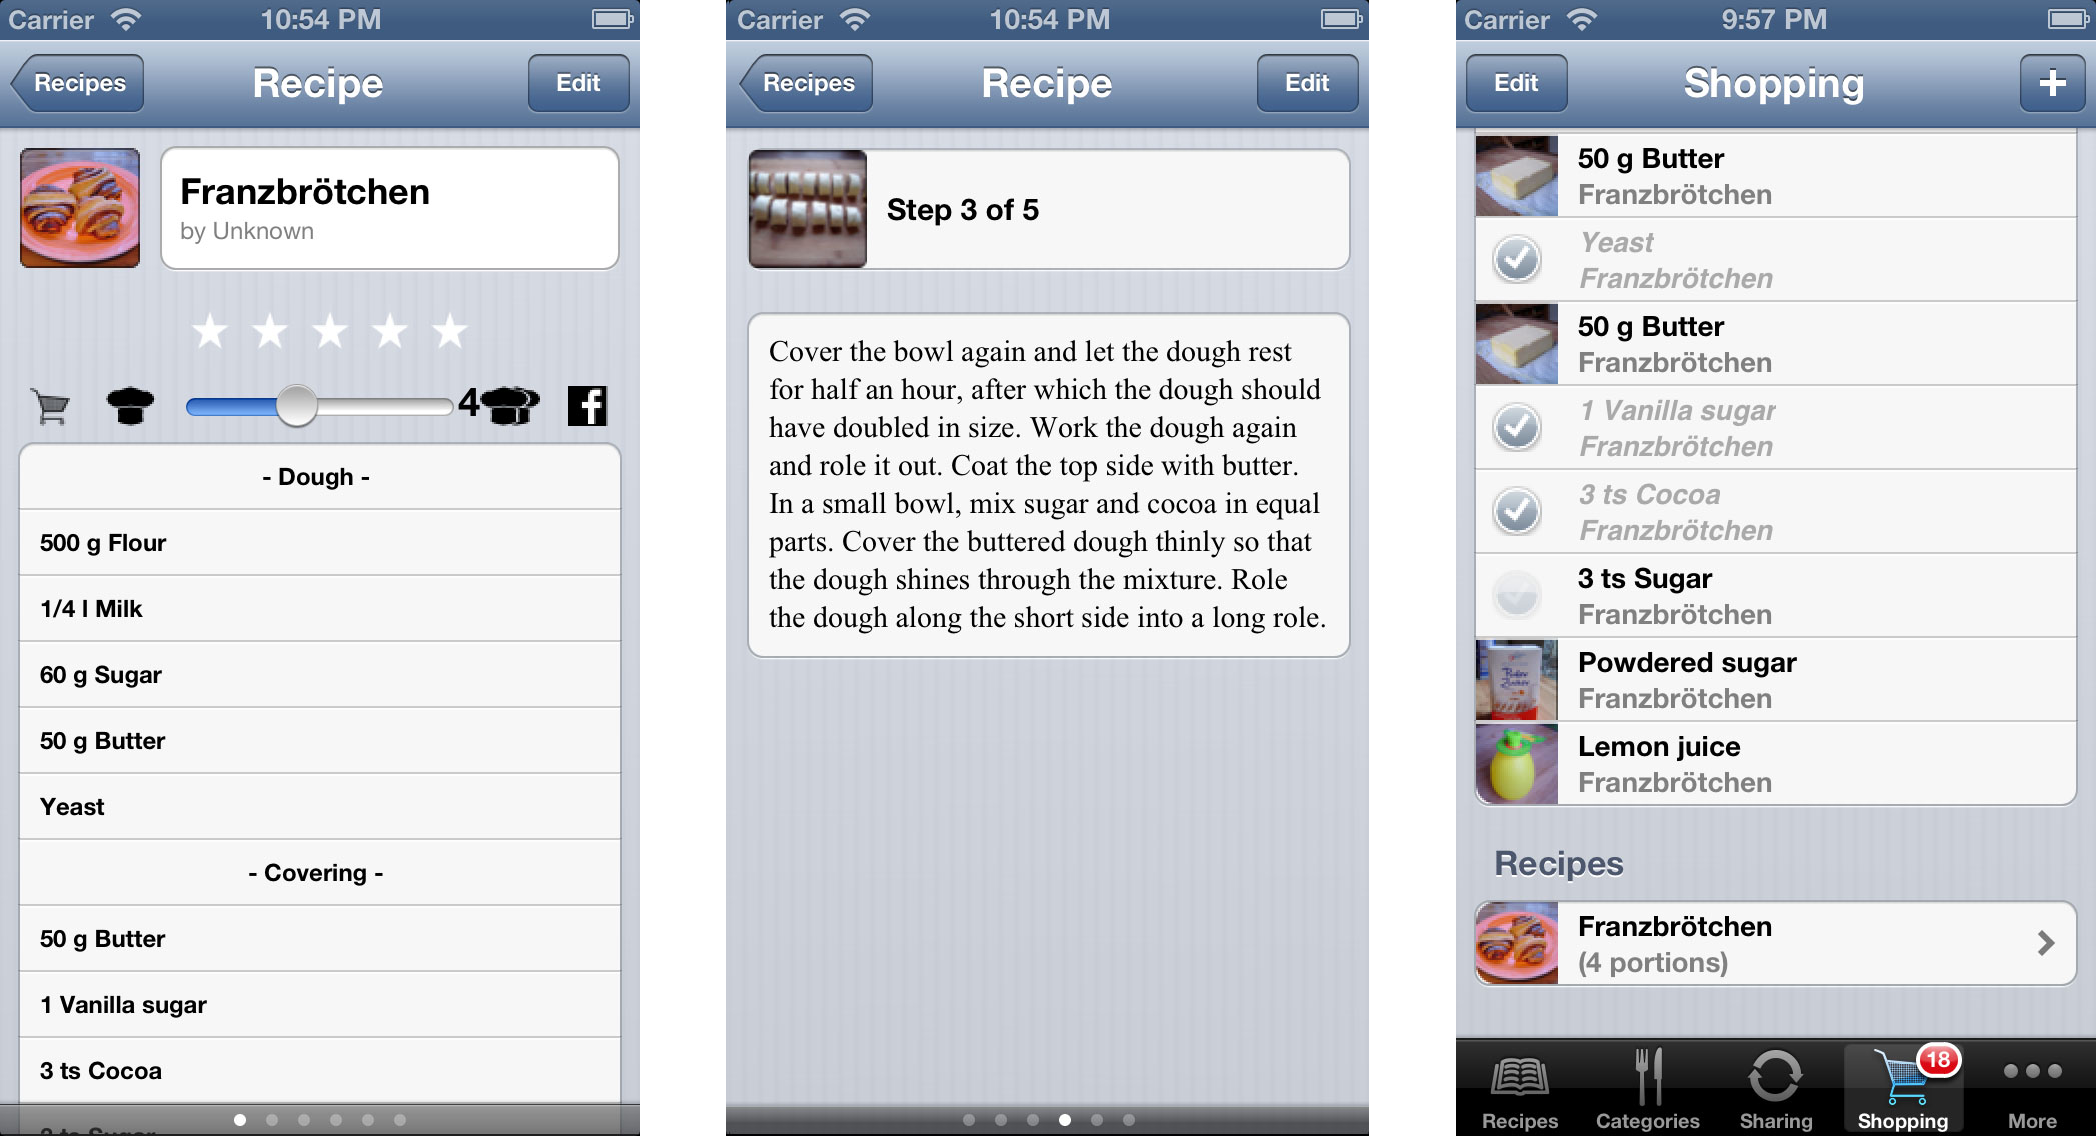 My favorite Recipes screenshots